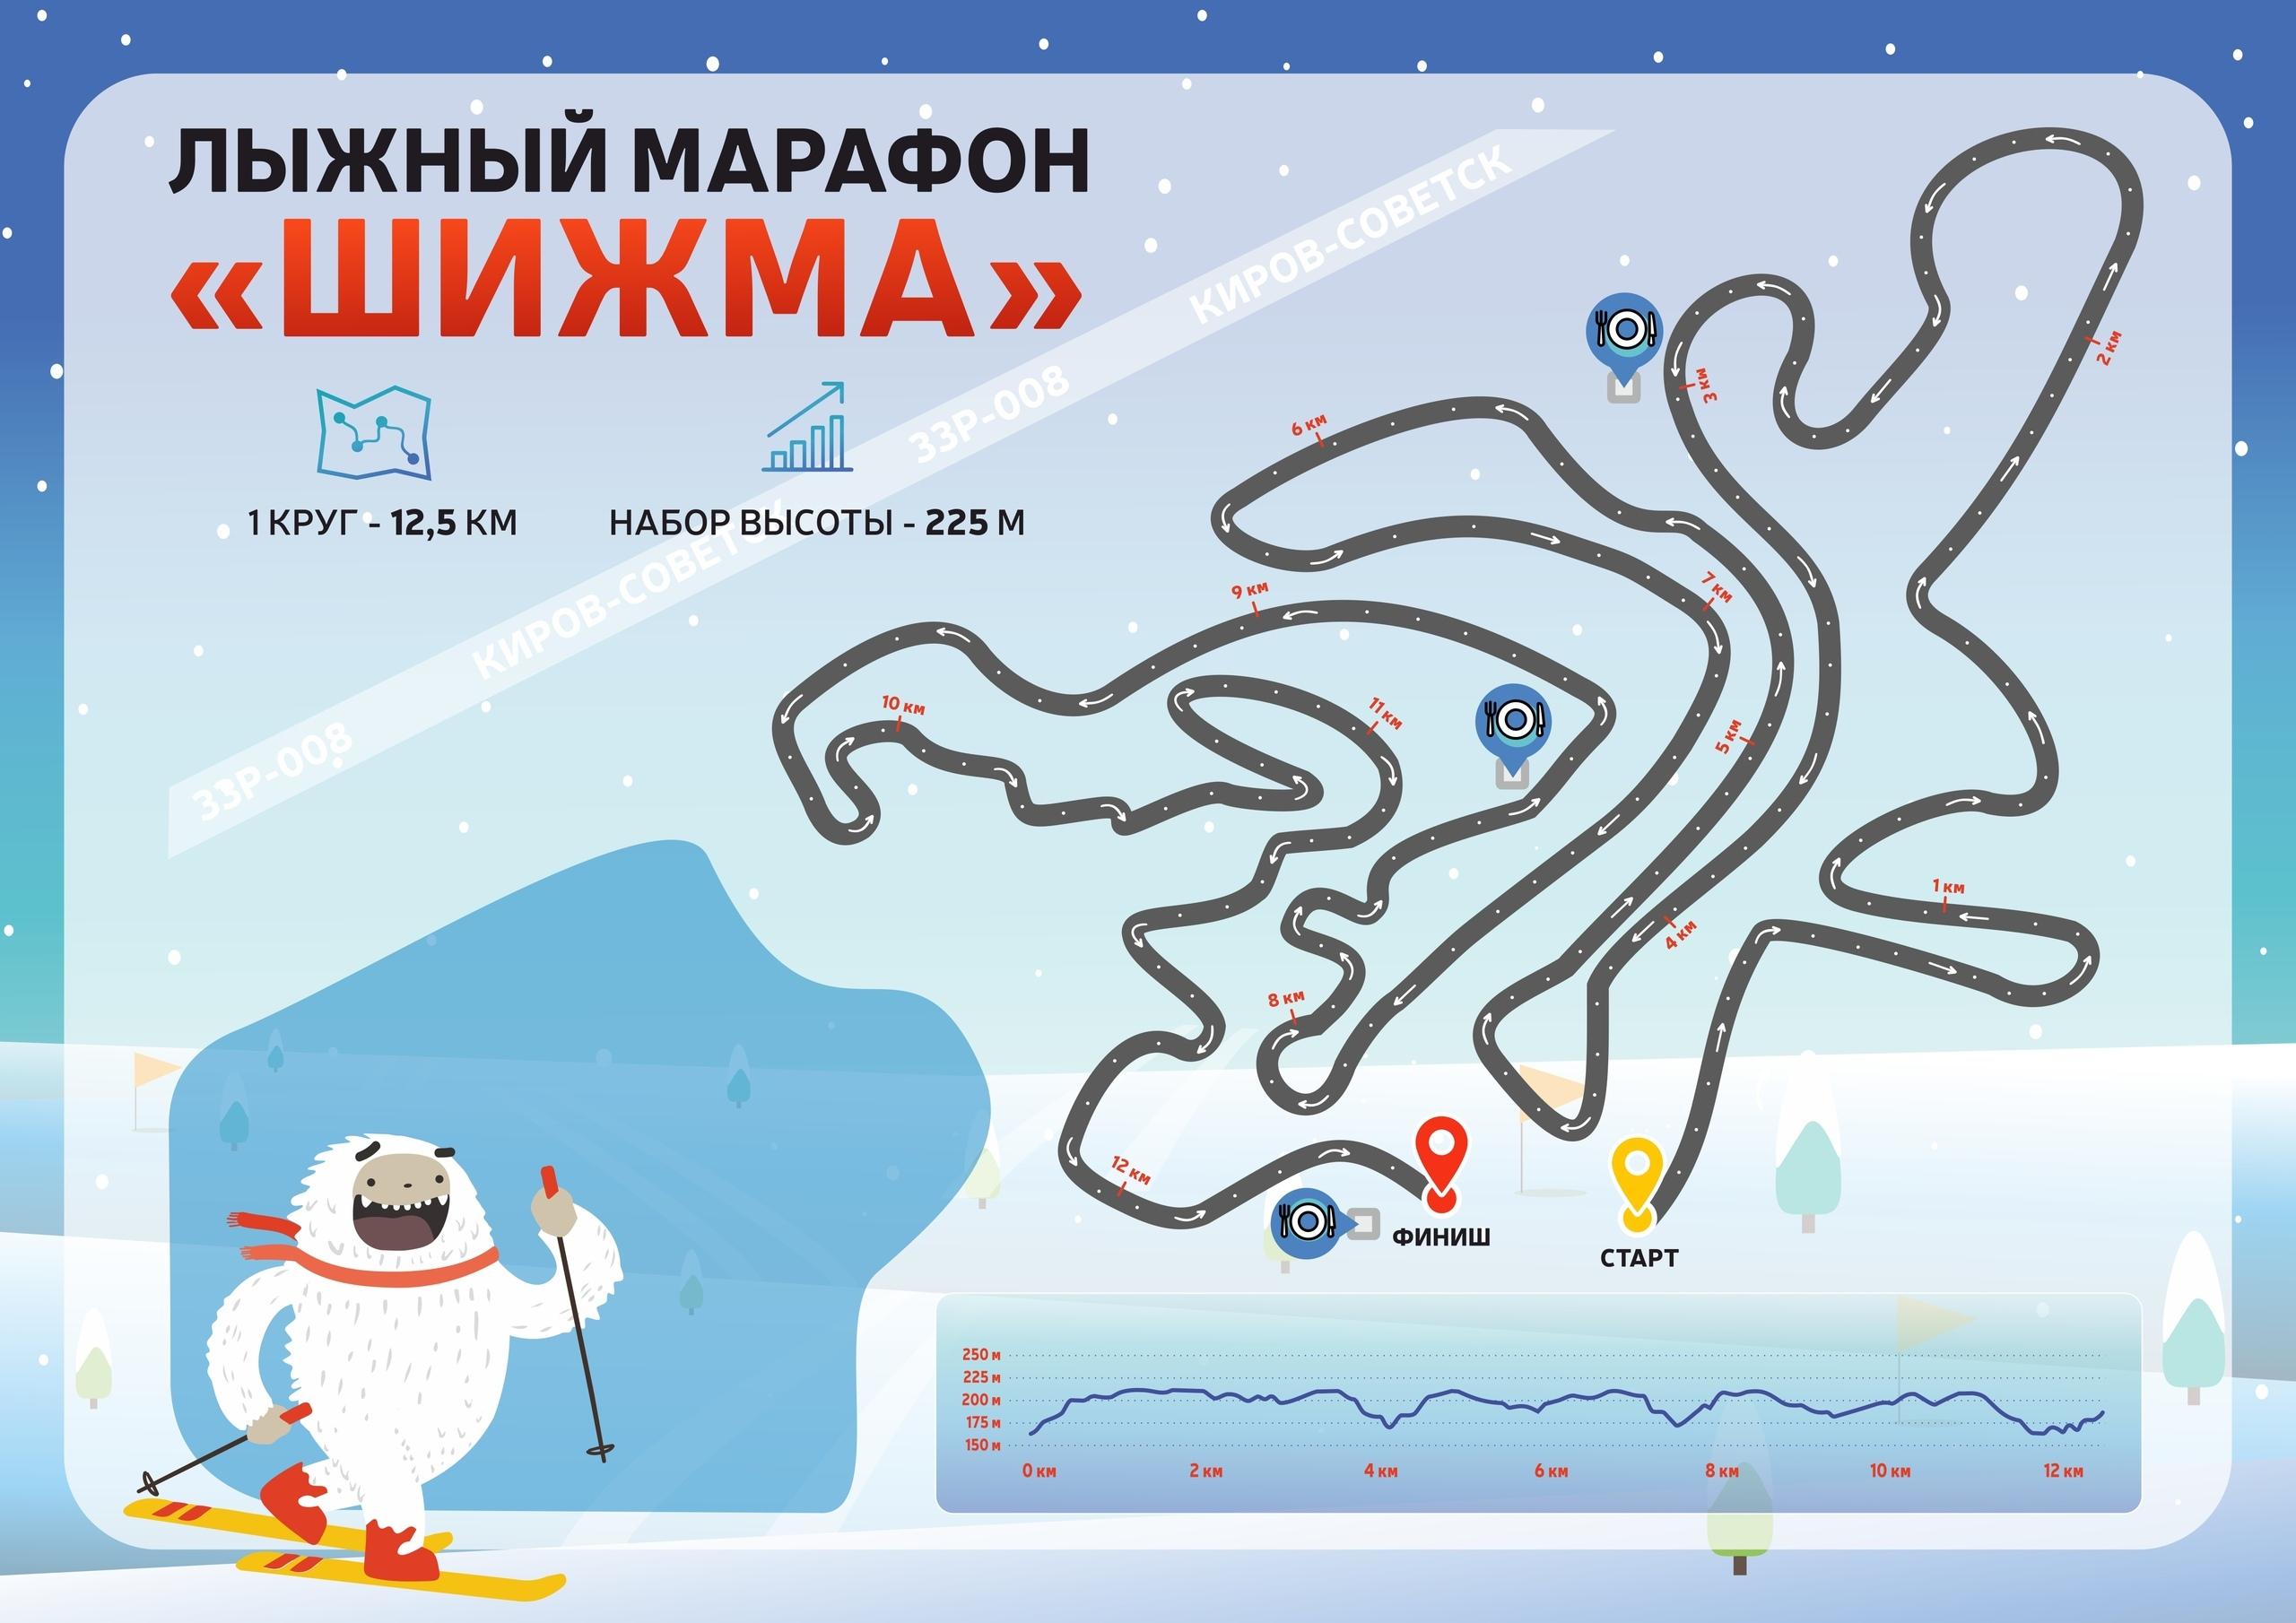 Карта-схема дистанции лыжного марафона Шижма 2020